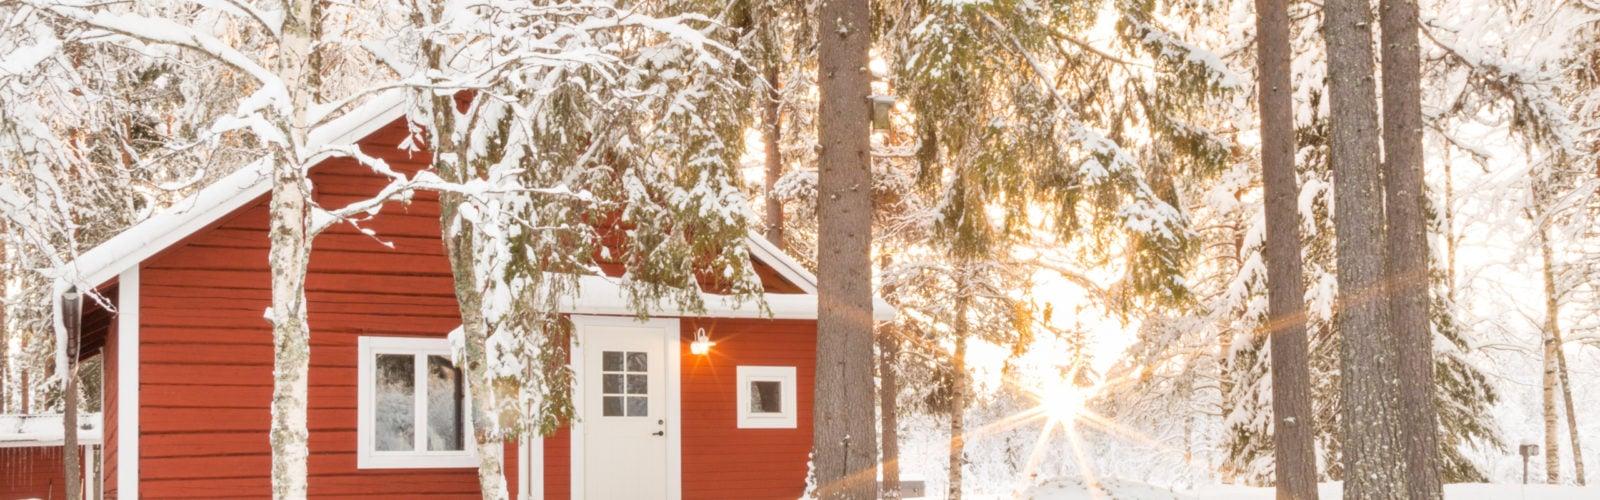 loggers-lodge-exterior-swedish-lapland